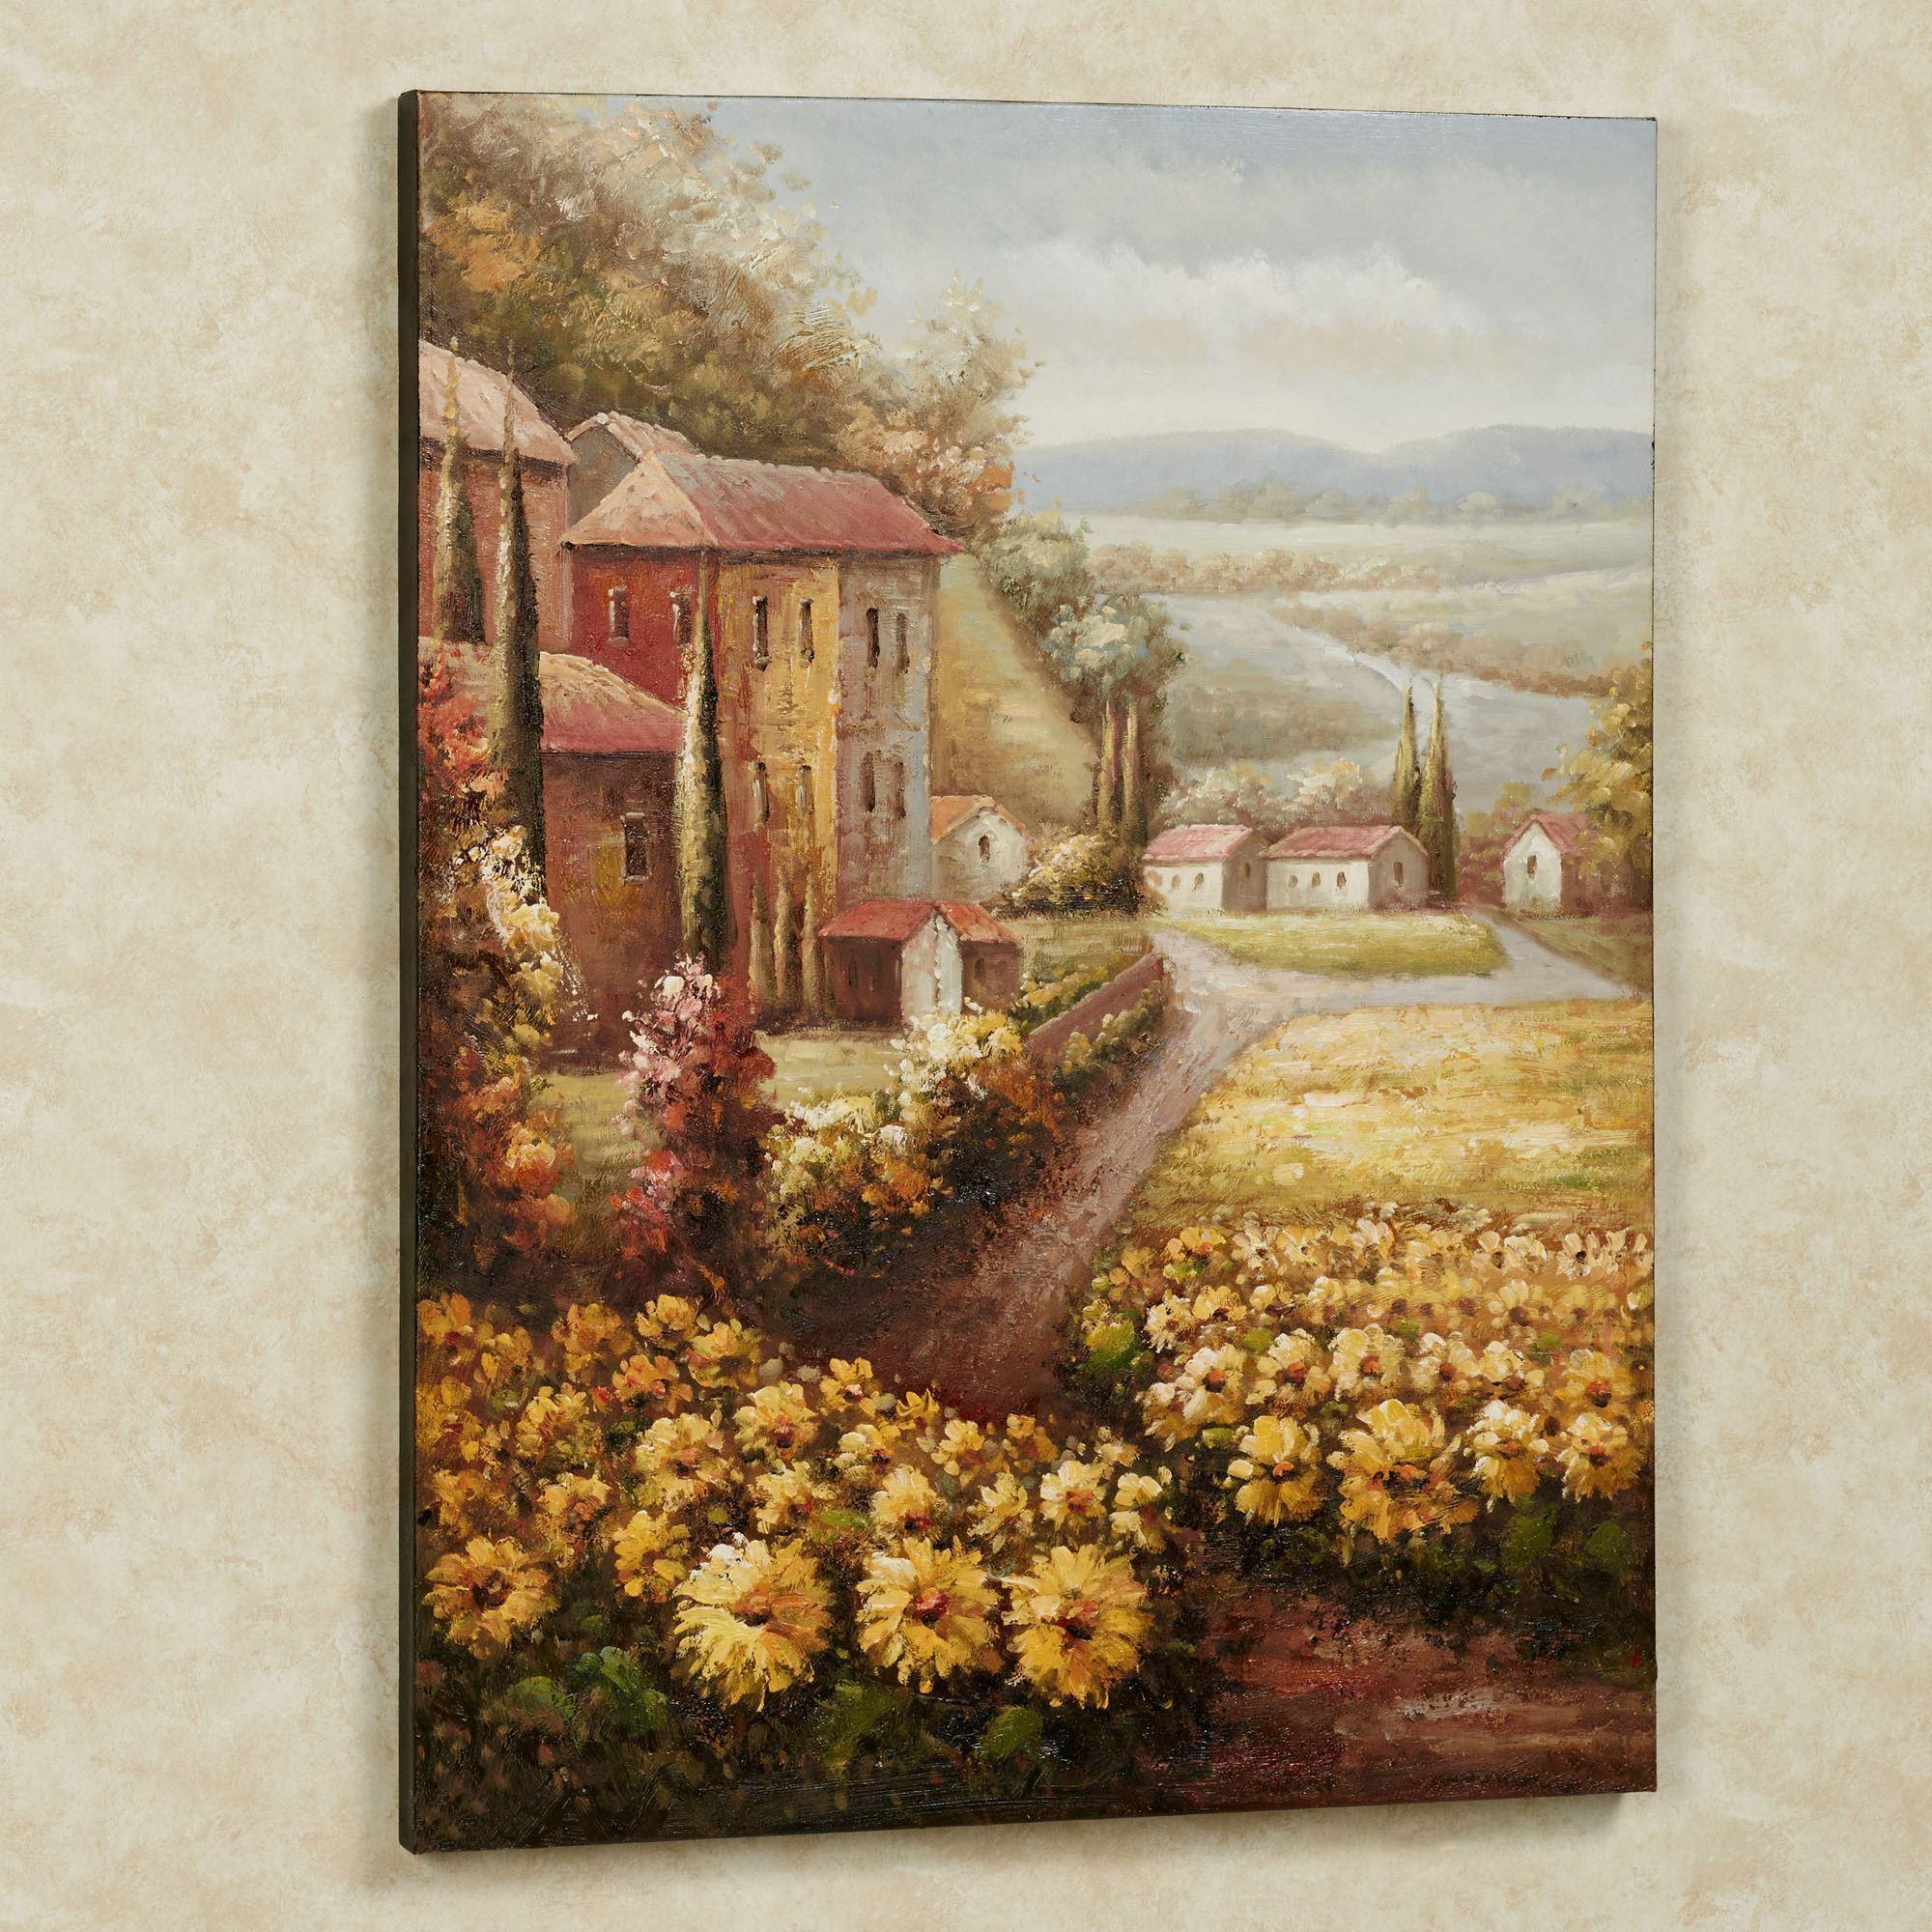 Tuscan Italian Art | Touch Of Class Regarding Italian Villa Wall Art (View 4 of 20)